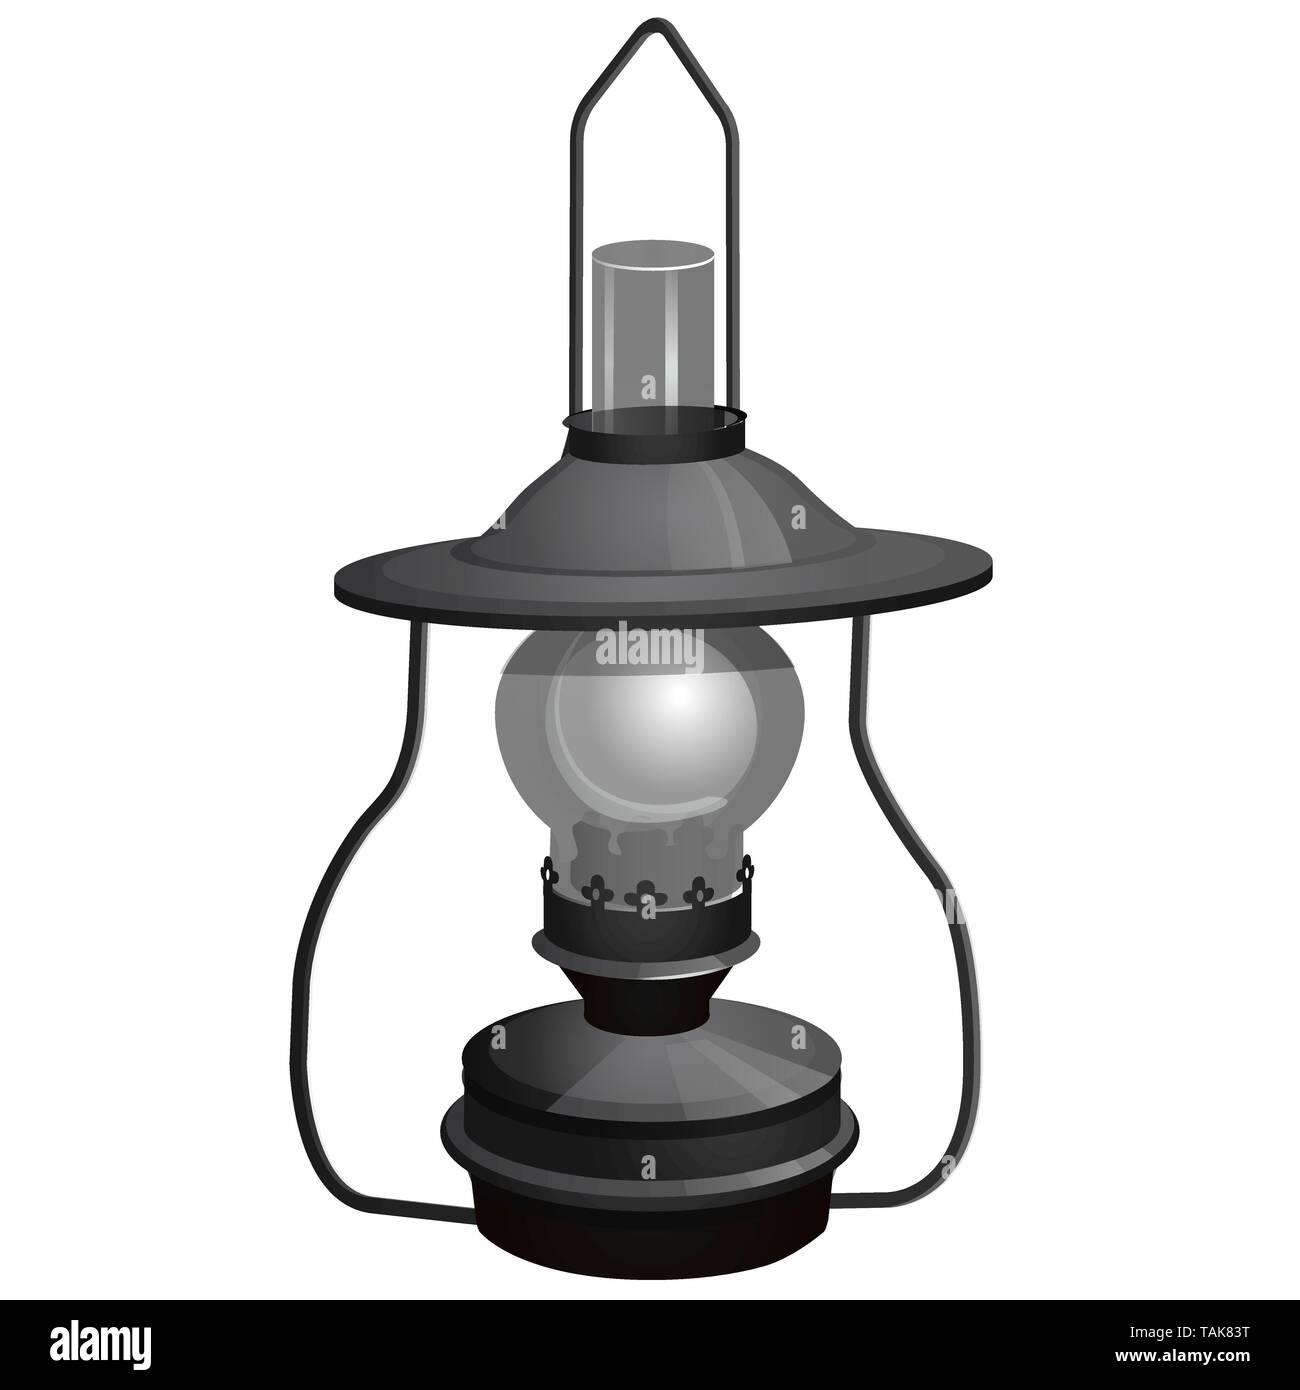 Portable kerosene lamp isolated on white background. Vector cartoon close-up illustration. - Stock Vector